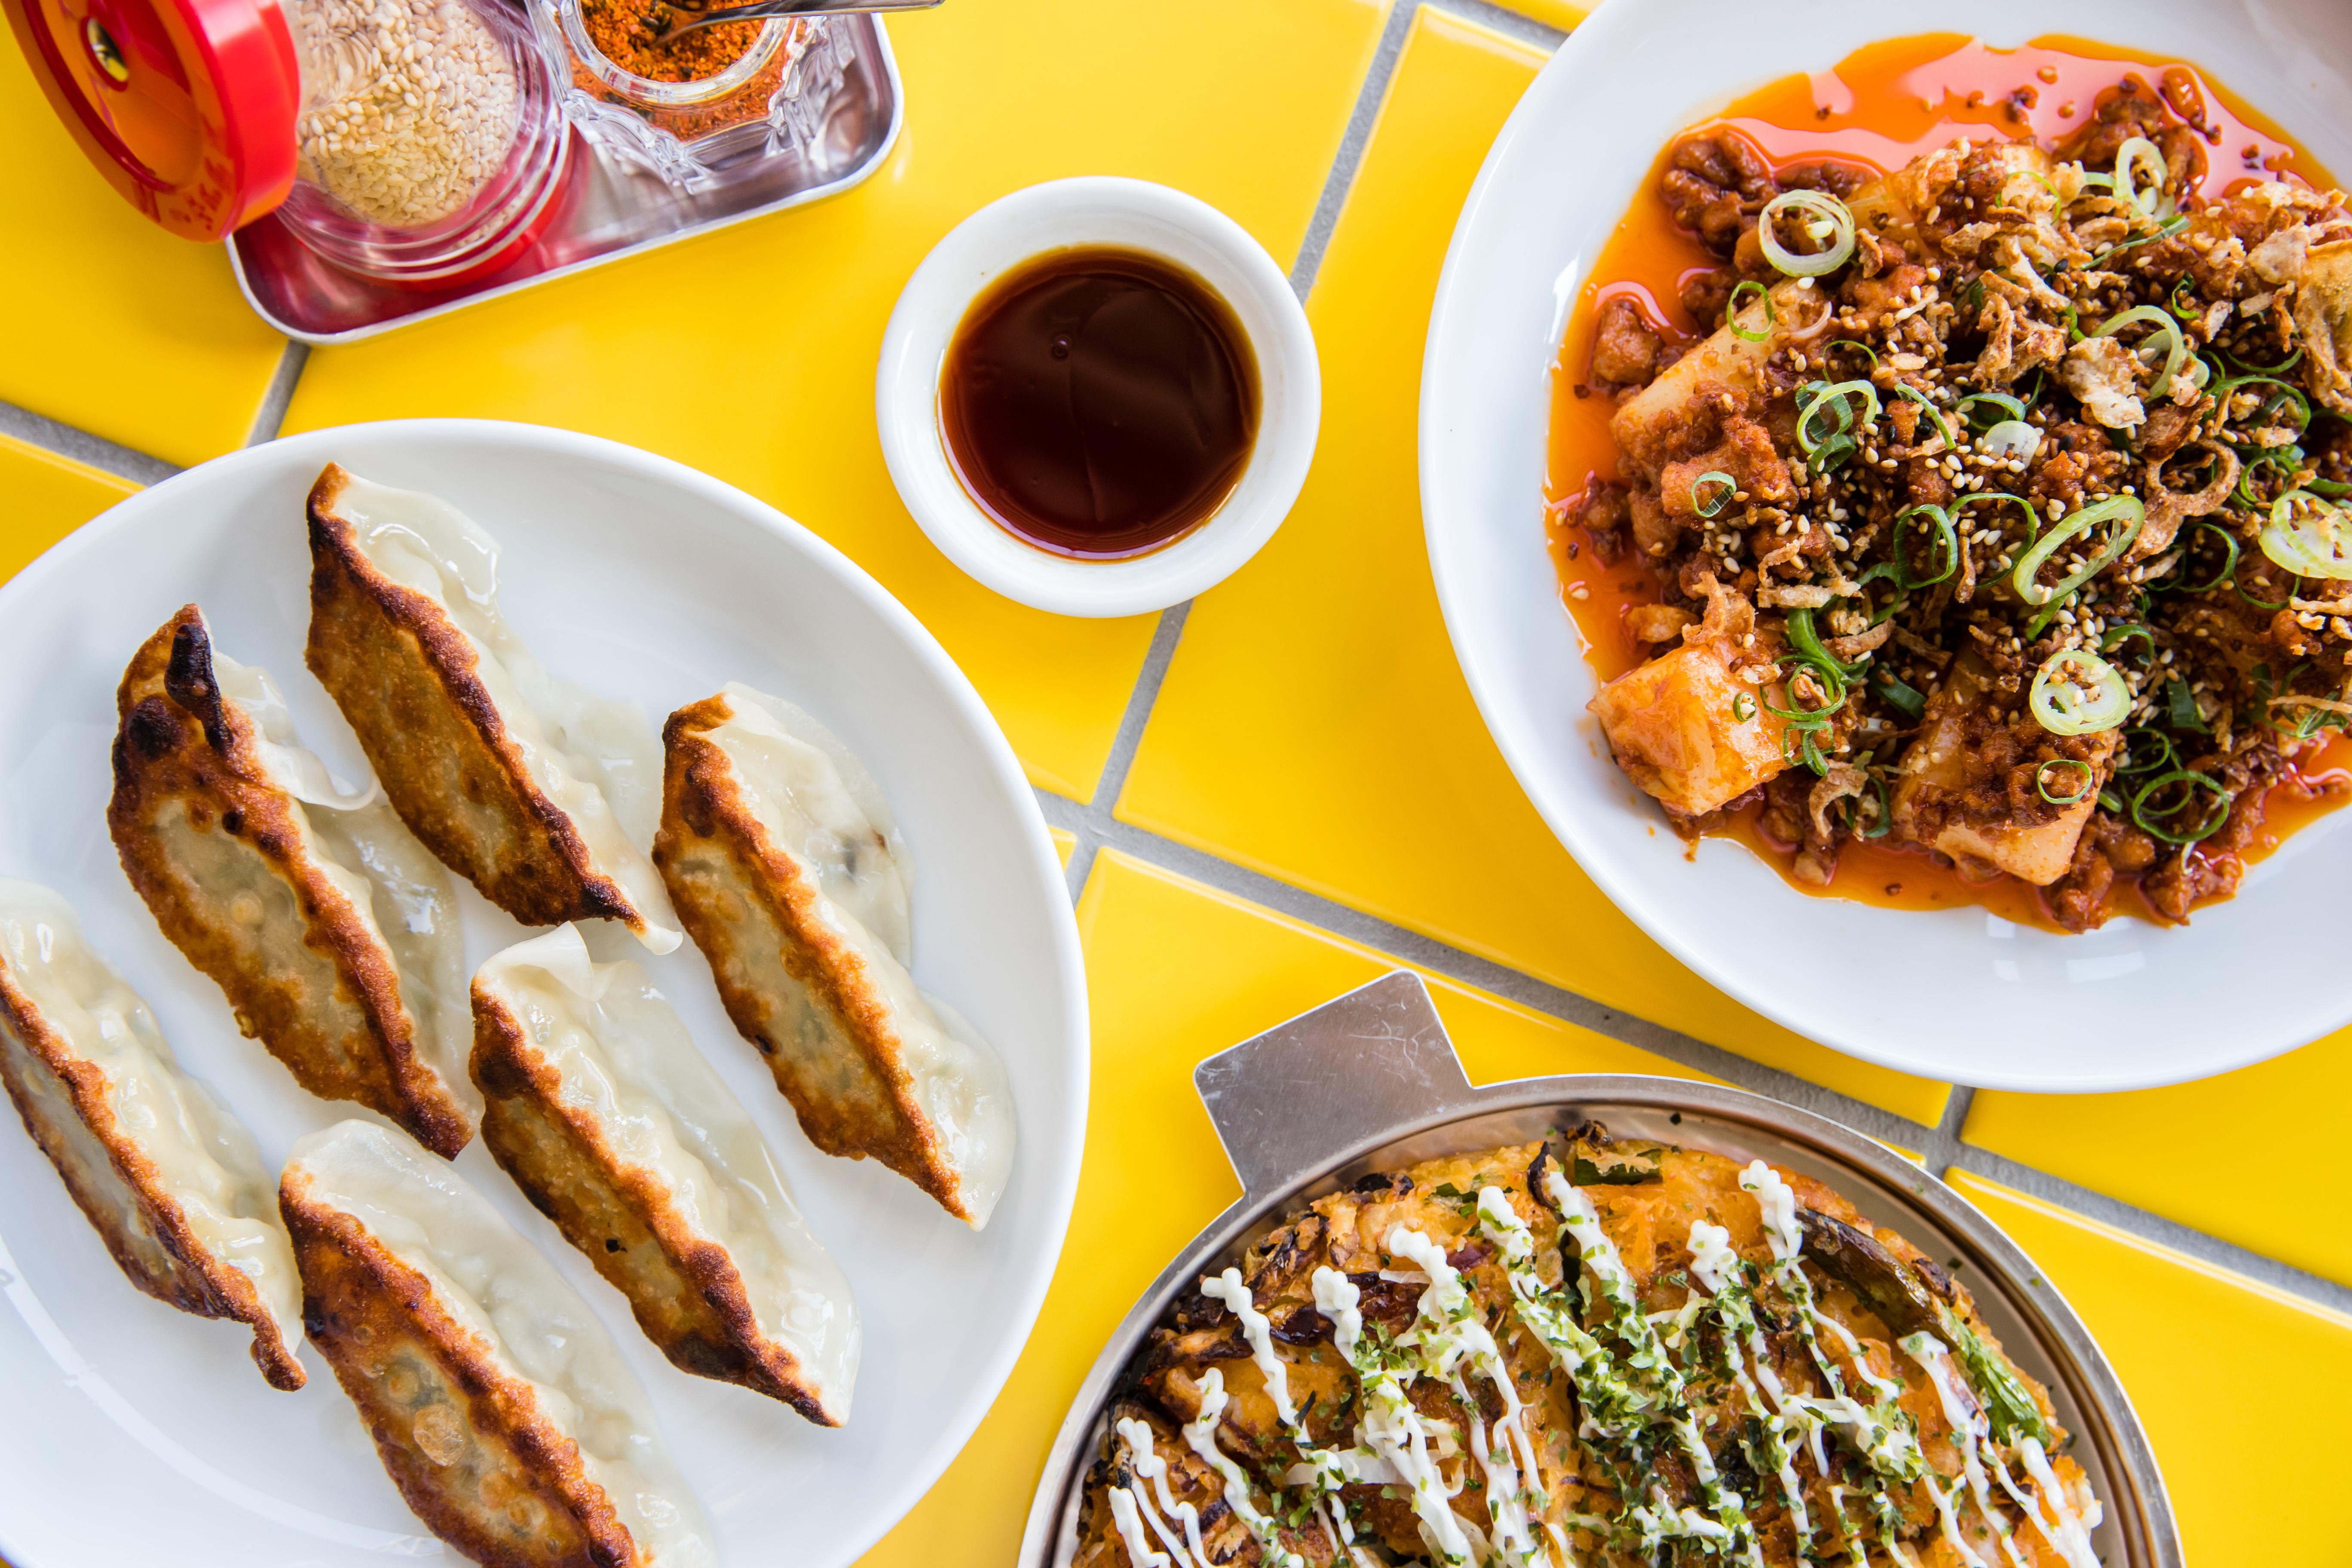 Barthelmess operated Yoko DIning will dish up izakaya-style food.